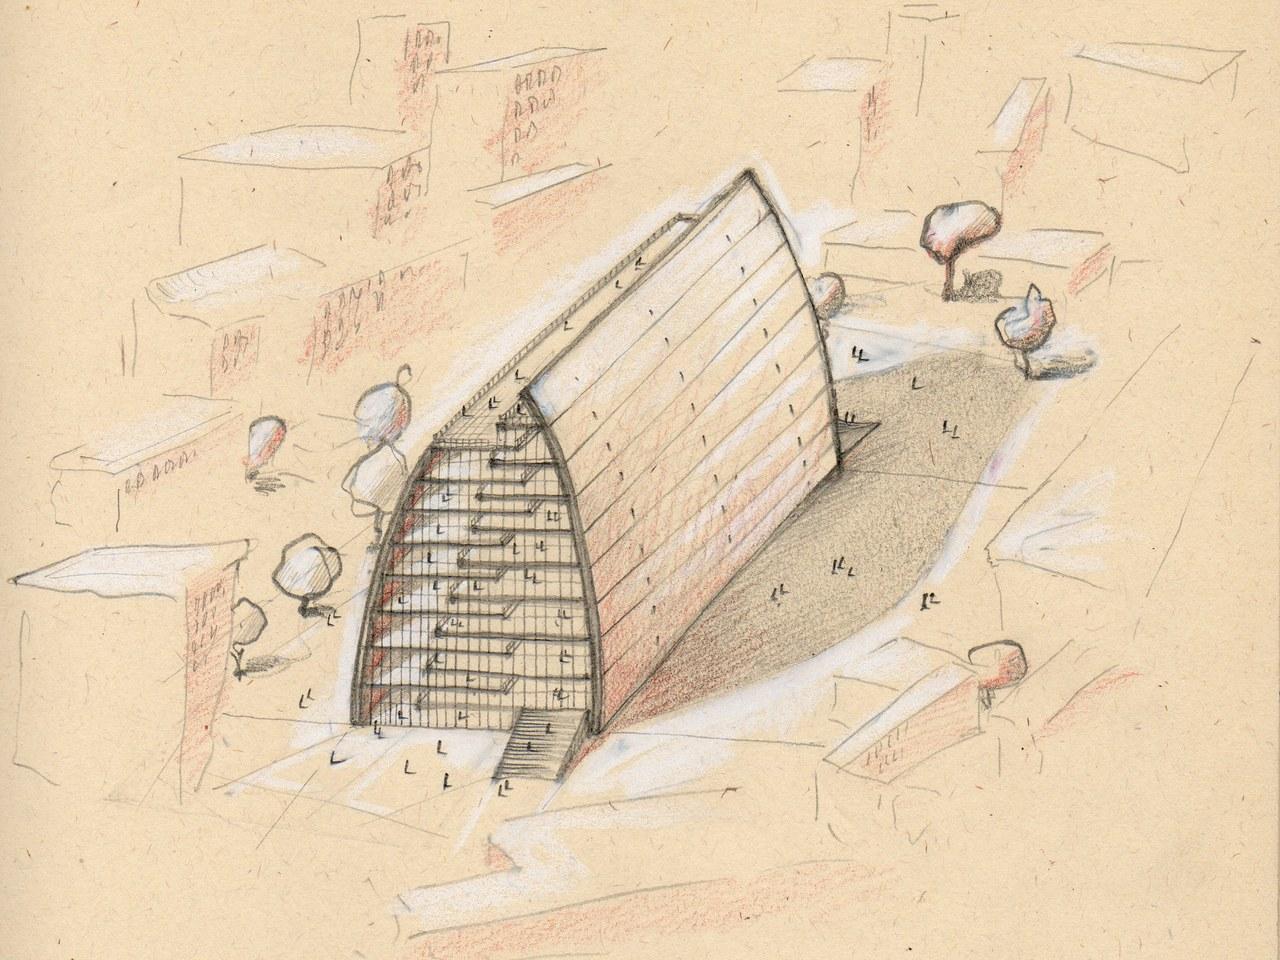 Literary_Architecture_Series-Jun'ichirō-Tanizaki_La-chiave